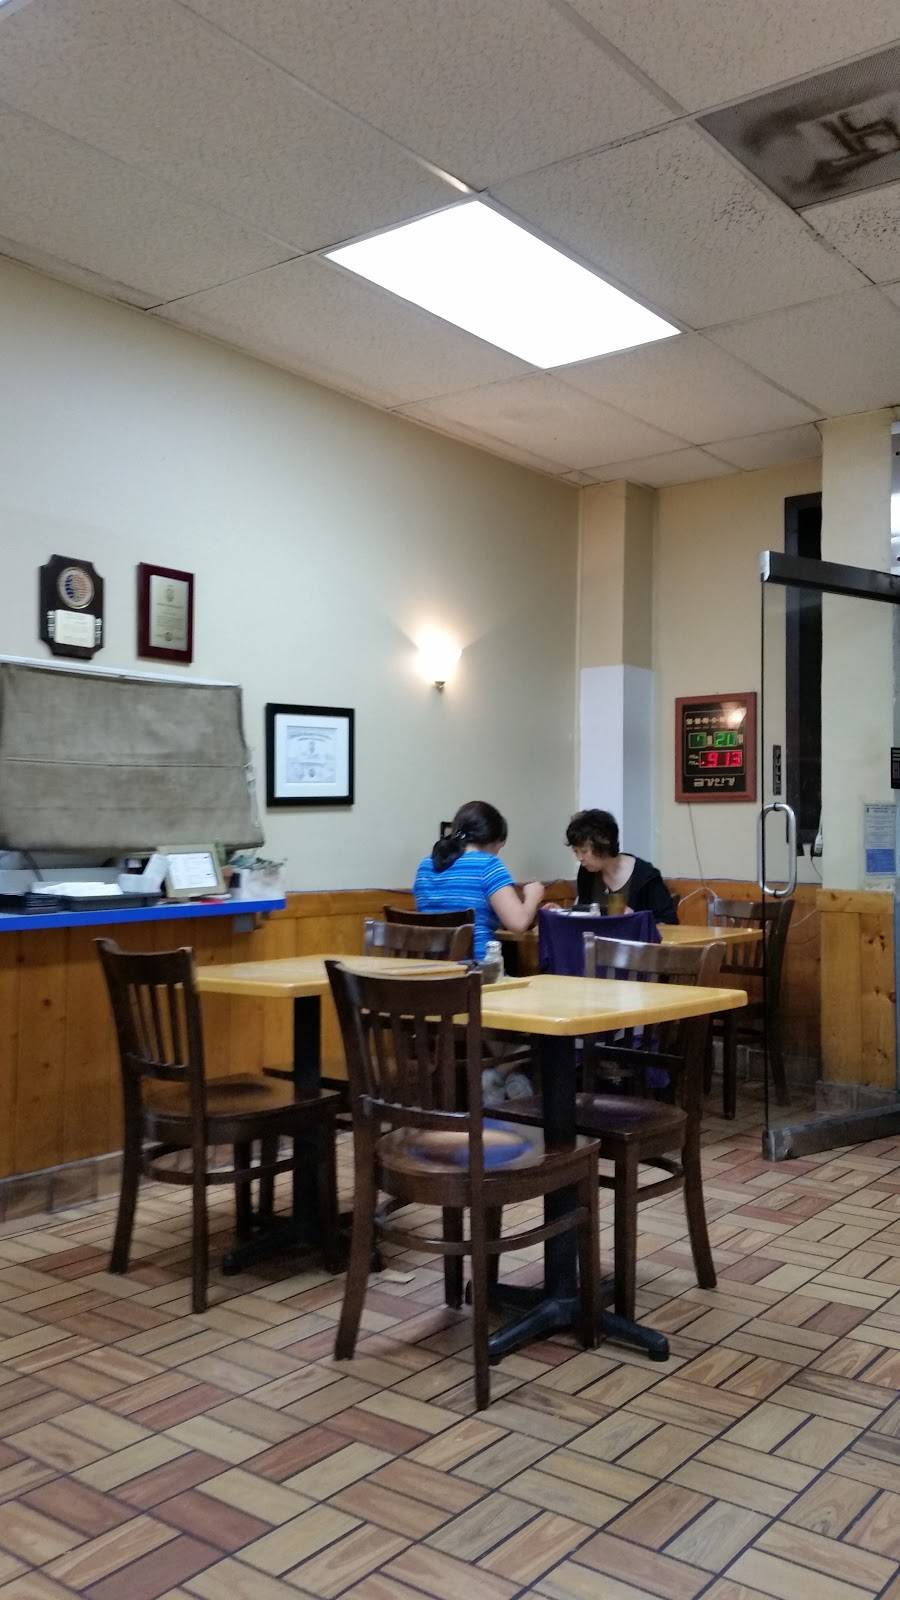 Han Bat Shul Lung Tang   restaurant   4163 W 5th St, Los Angeles, CA 90020, USA   2133839499 OR +1 213-383-9499